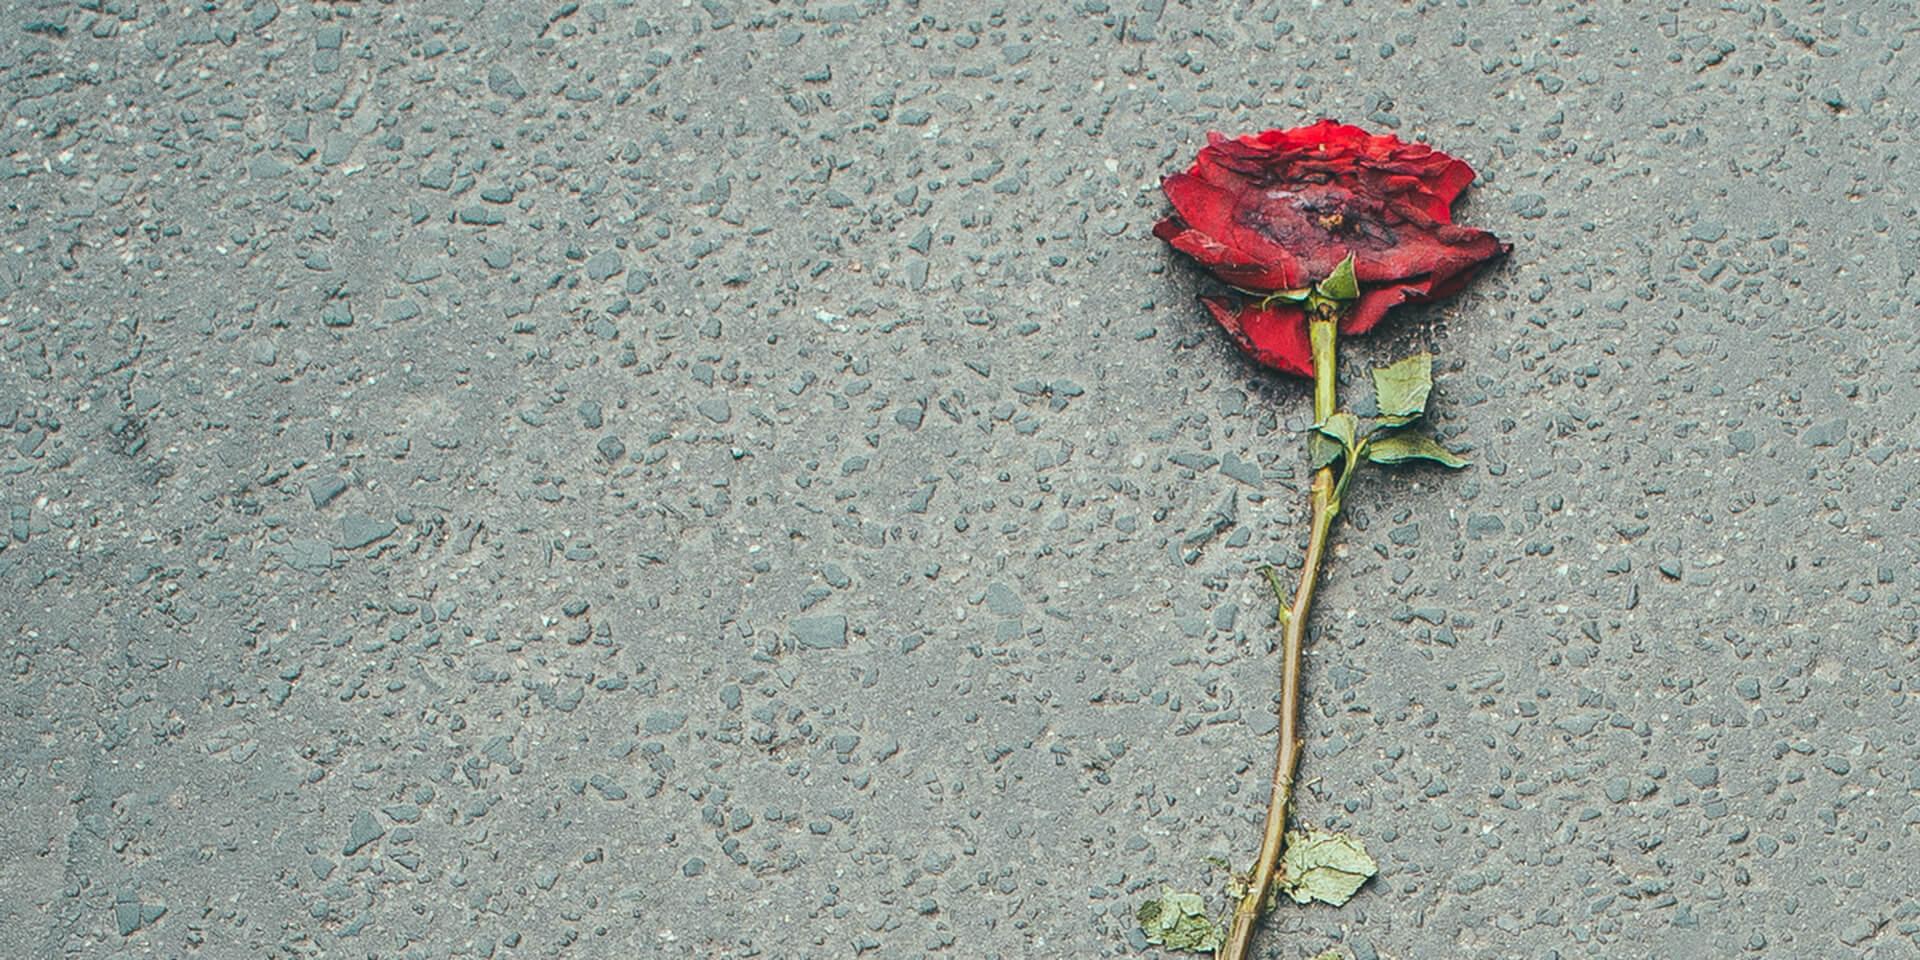 Zertretene Rose auf dem Asphalt